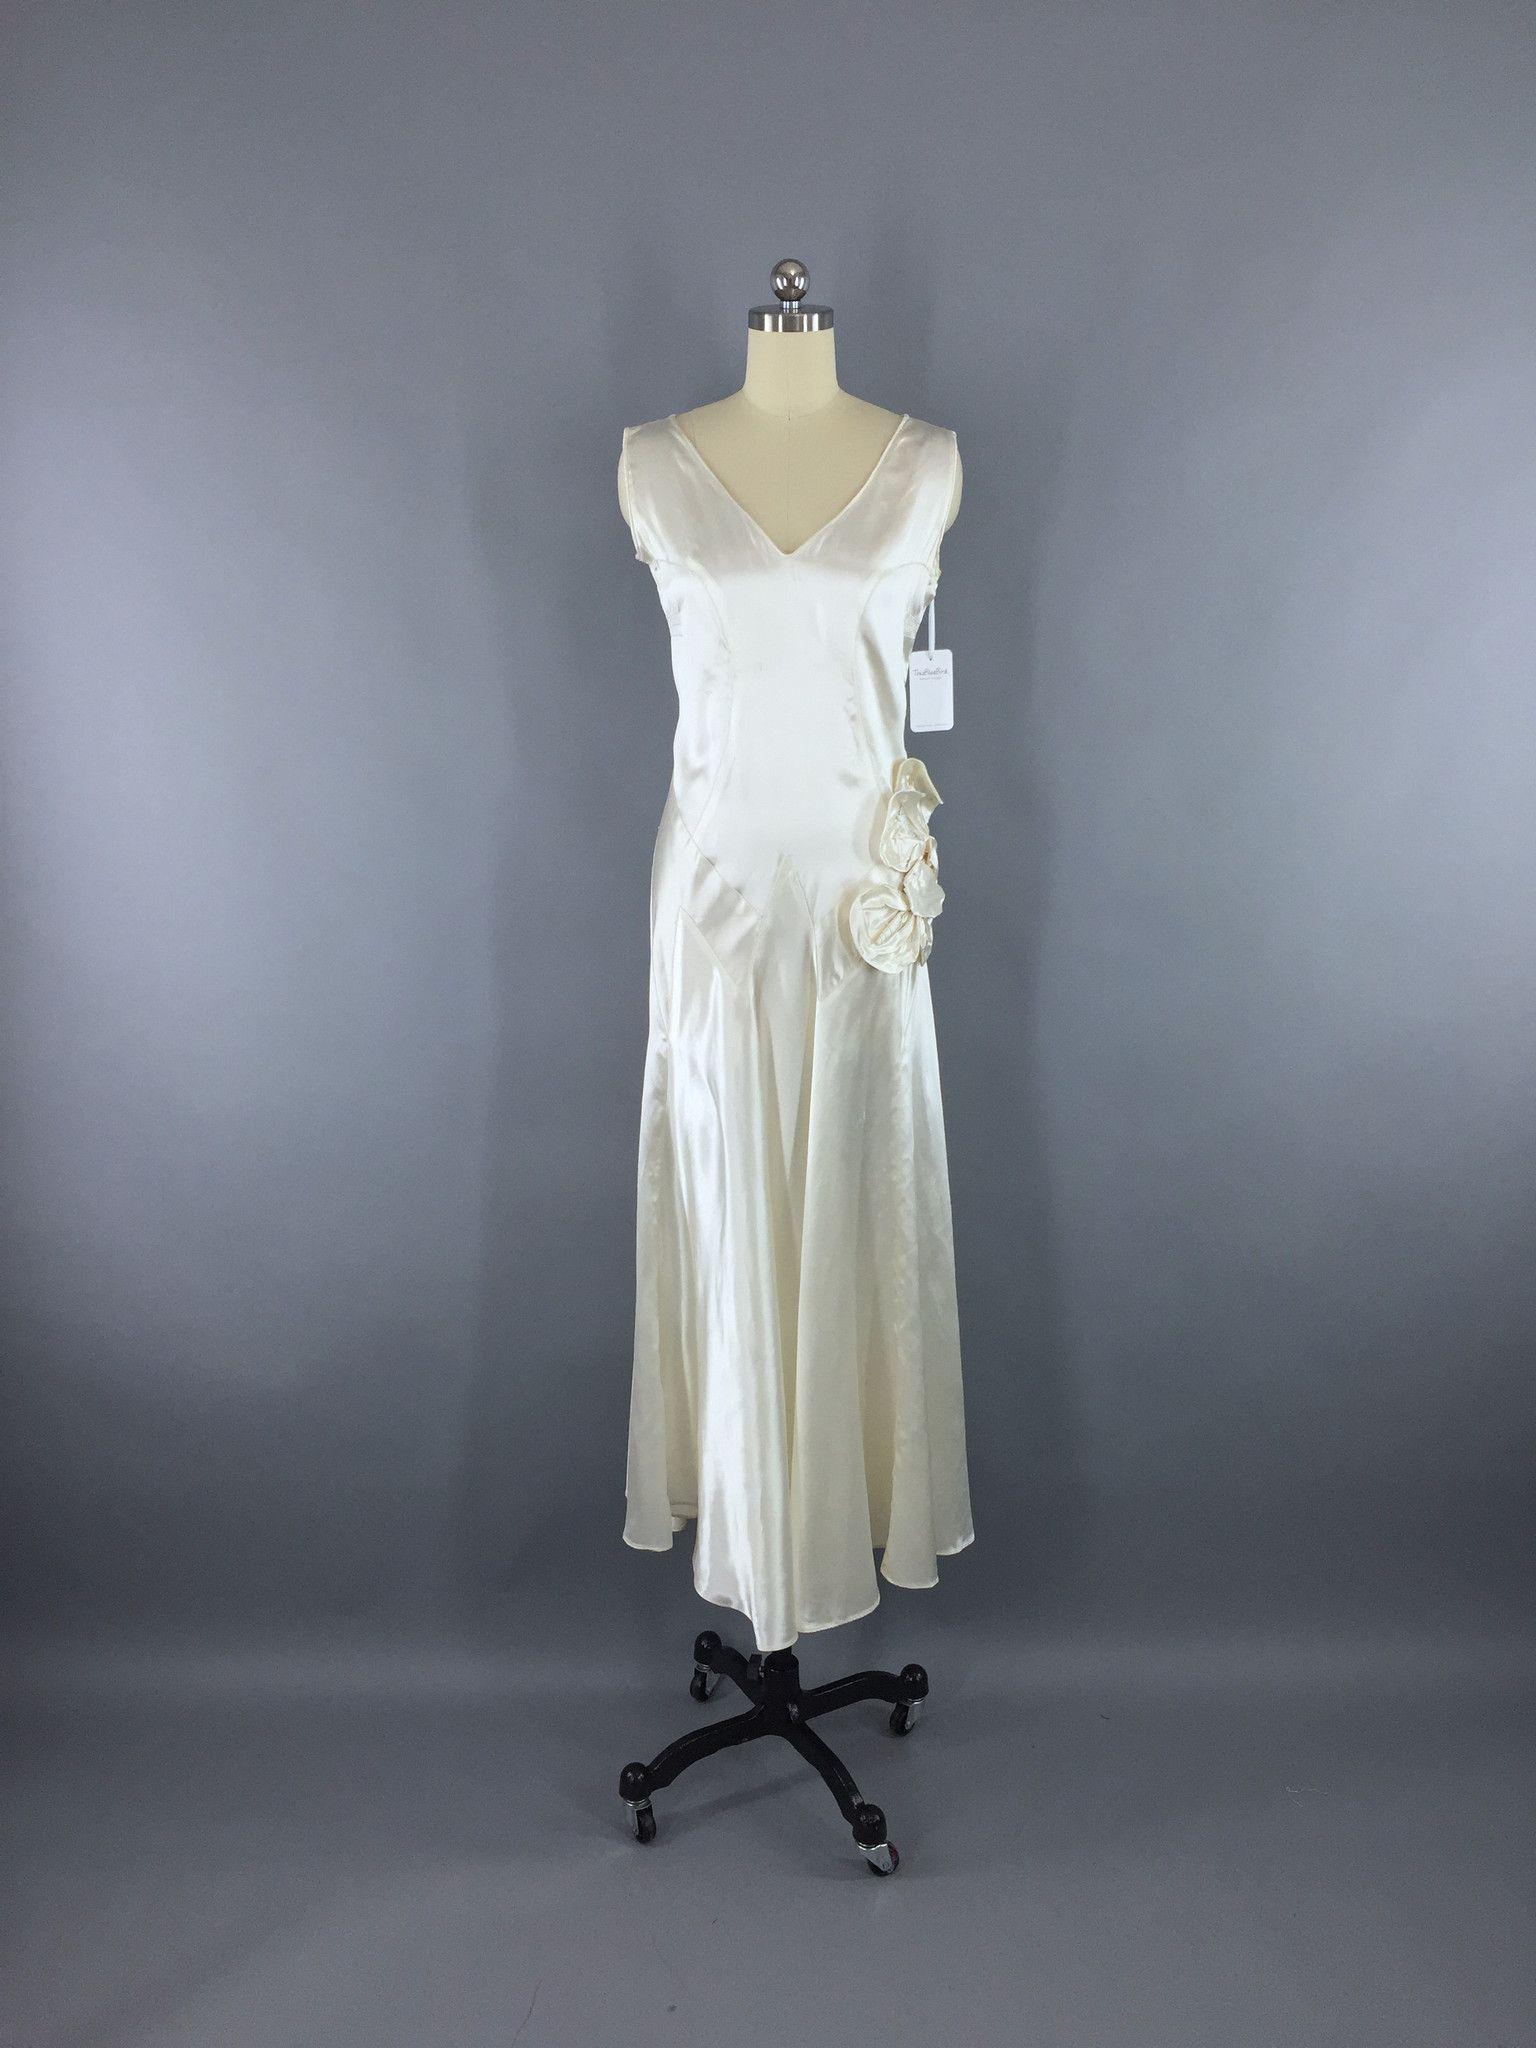 Vintage s art deco bias cut satin wedding gown dress white